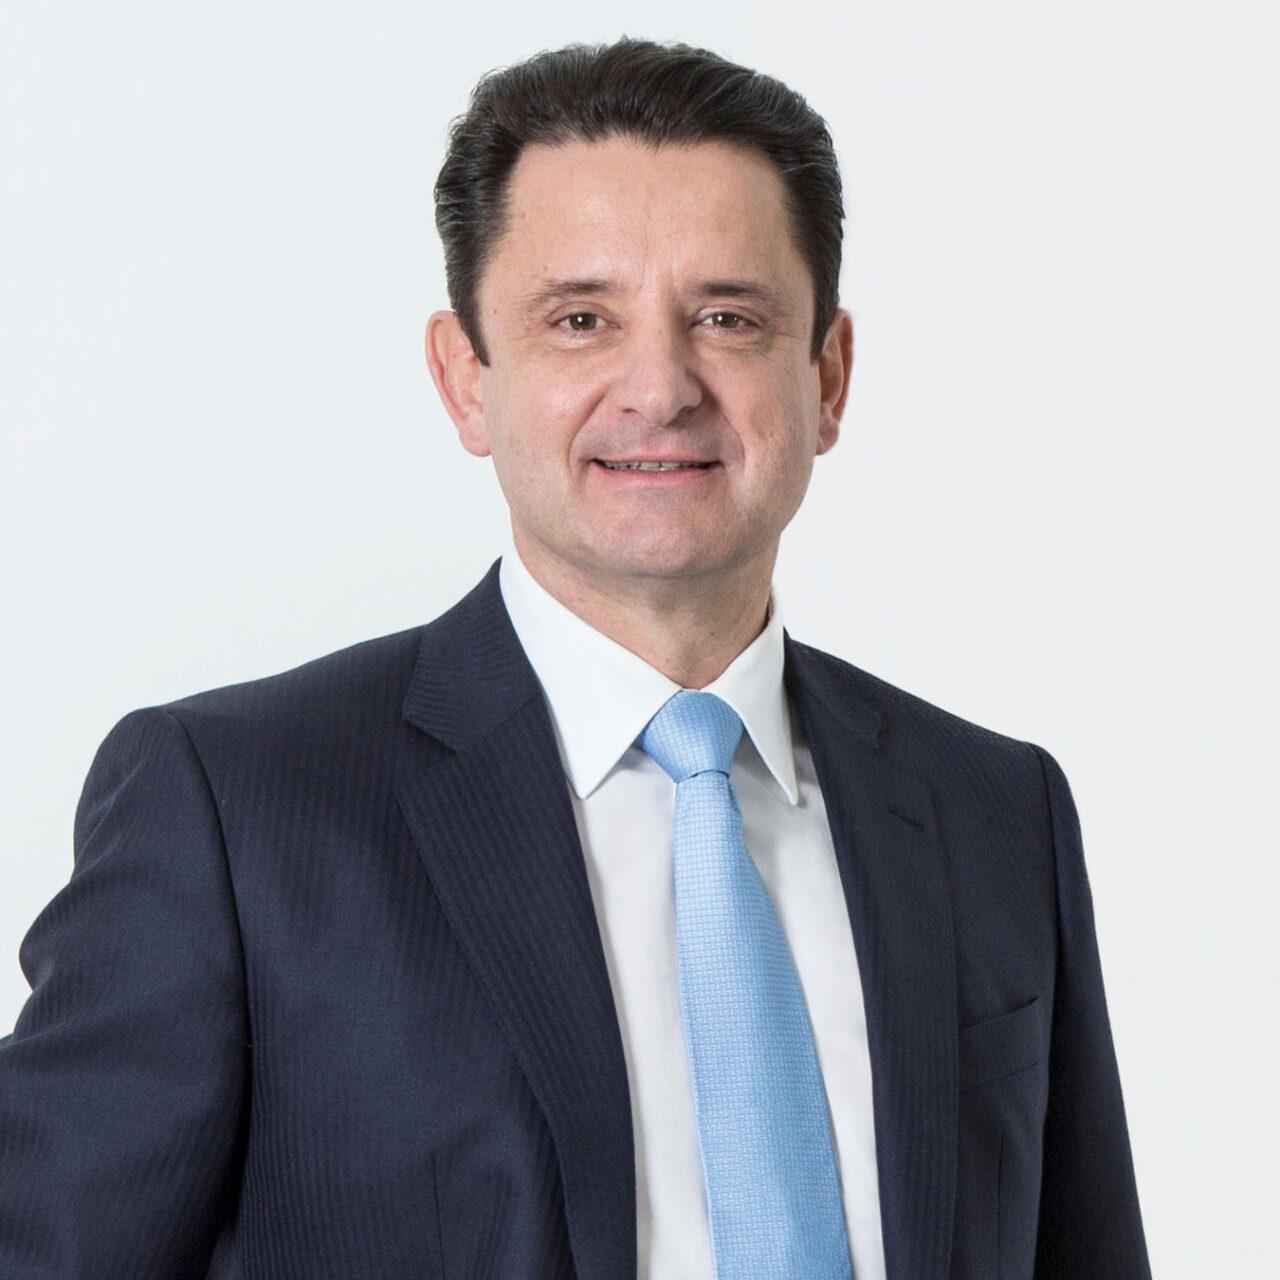 Kernaufgabe Stärkung des europäischen Kapitalmarkts